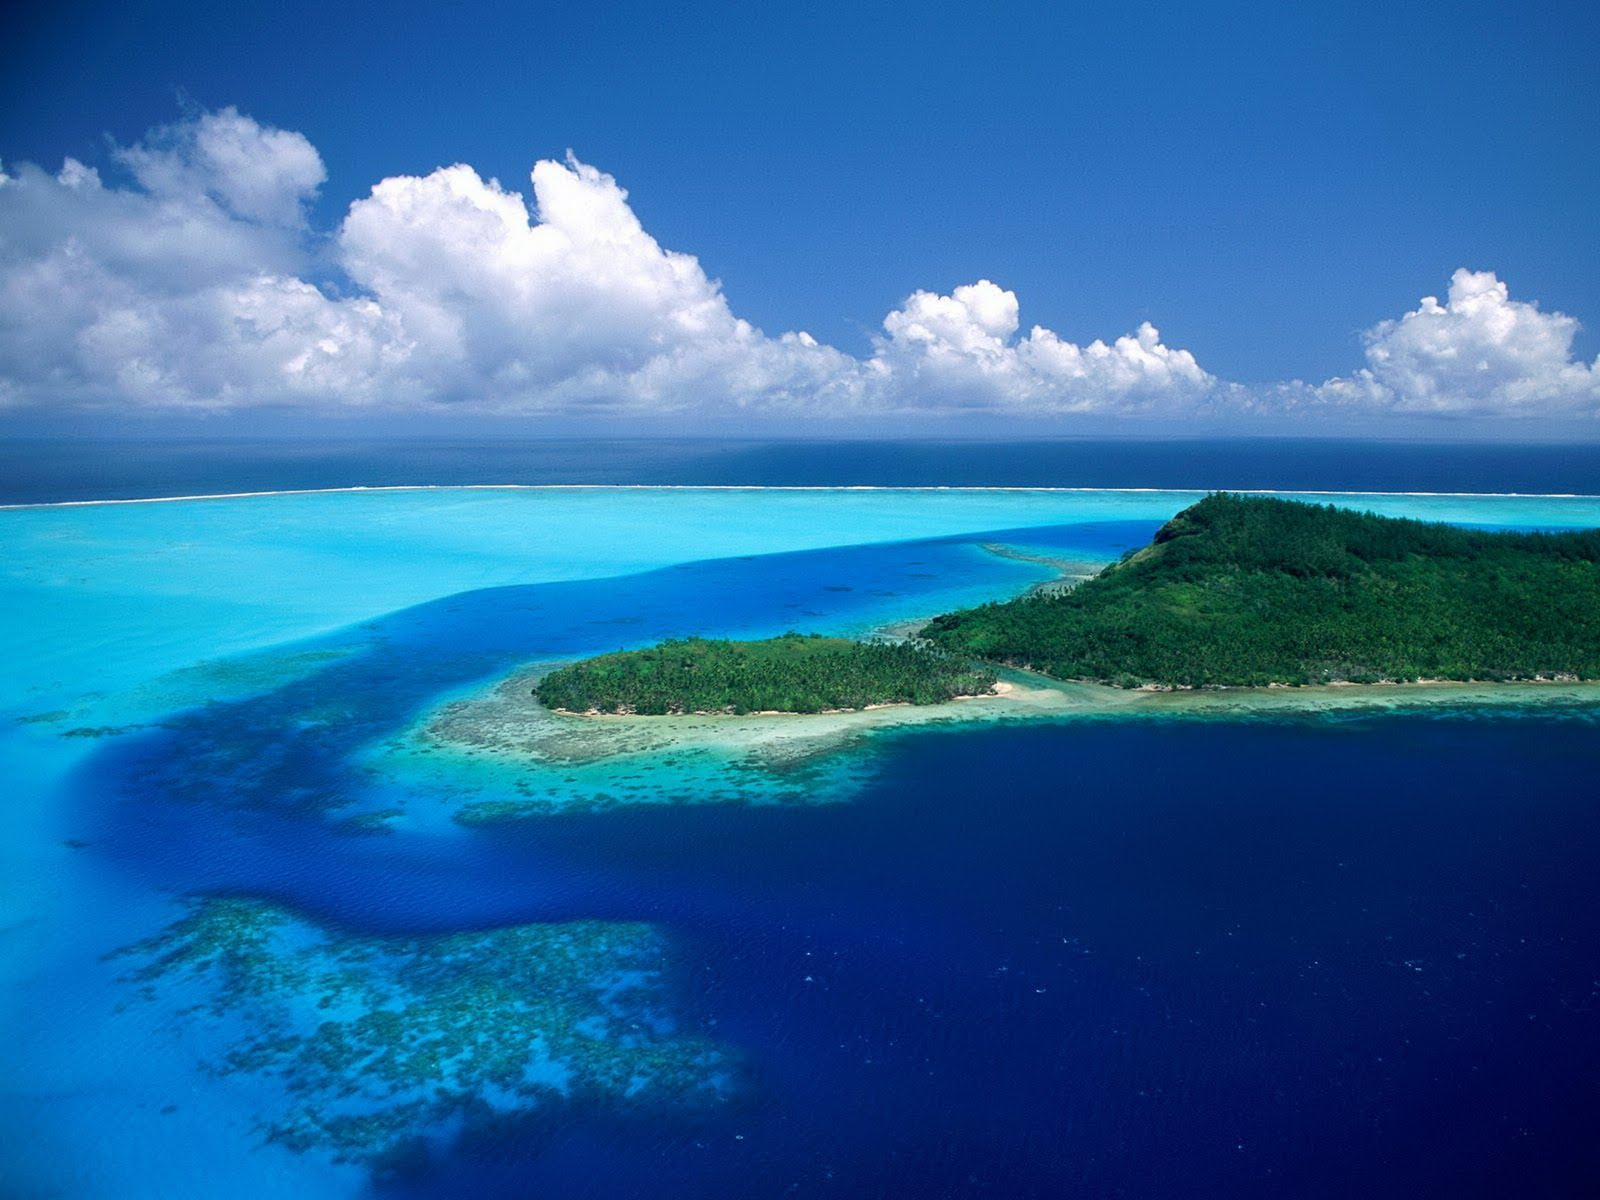 ocean nature pacific amazing beauty beach sea desktop natural wallpapers south island breathtaking desktops beaches most